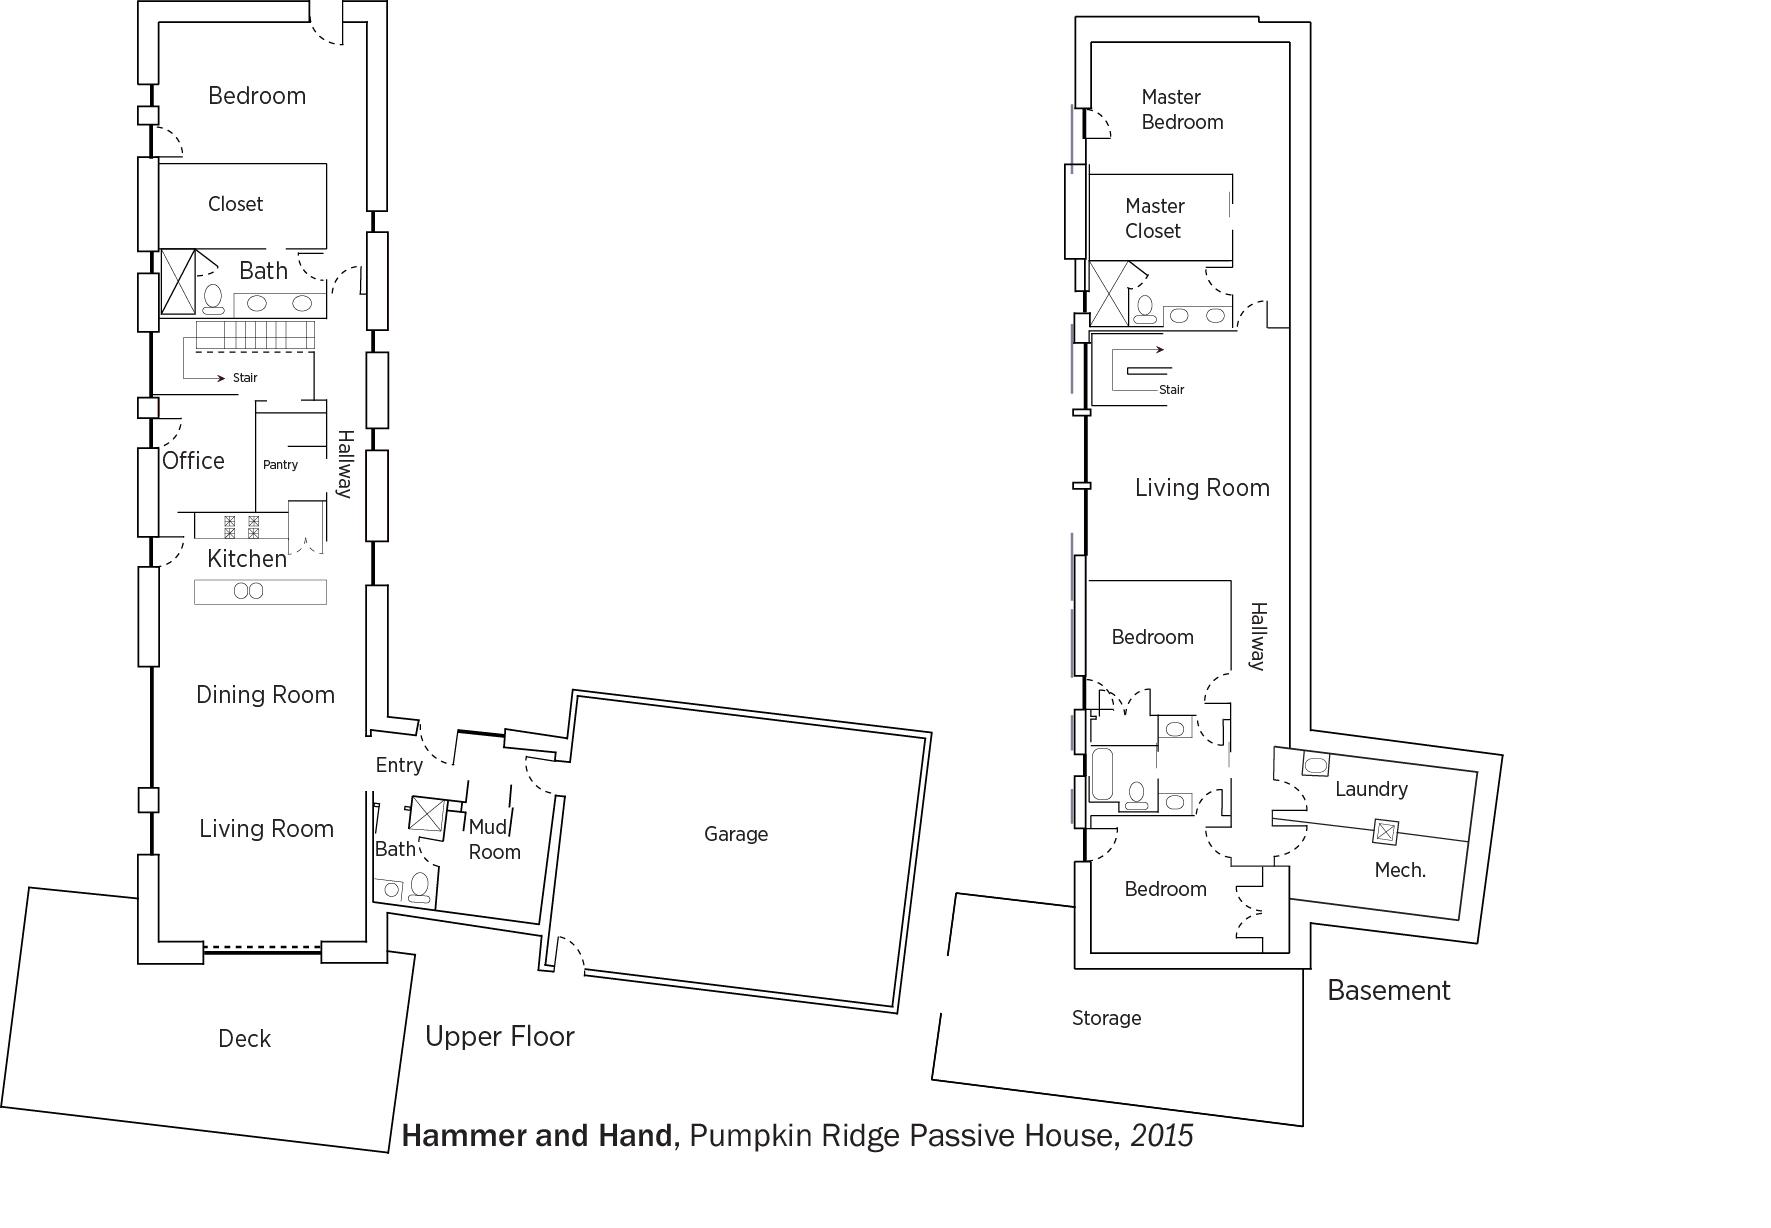 Doe Tour Of Zero Pumpkin Ridge Passive House By Hammer